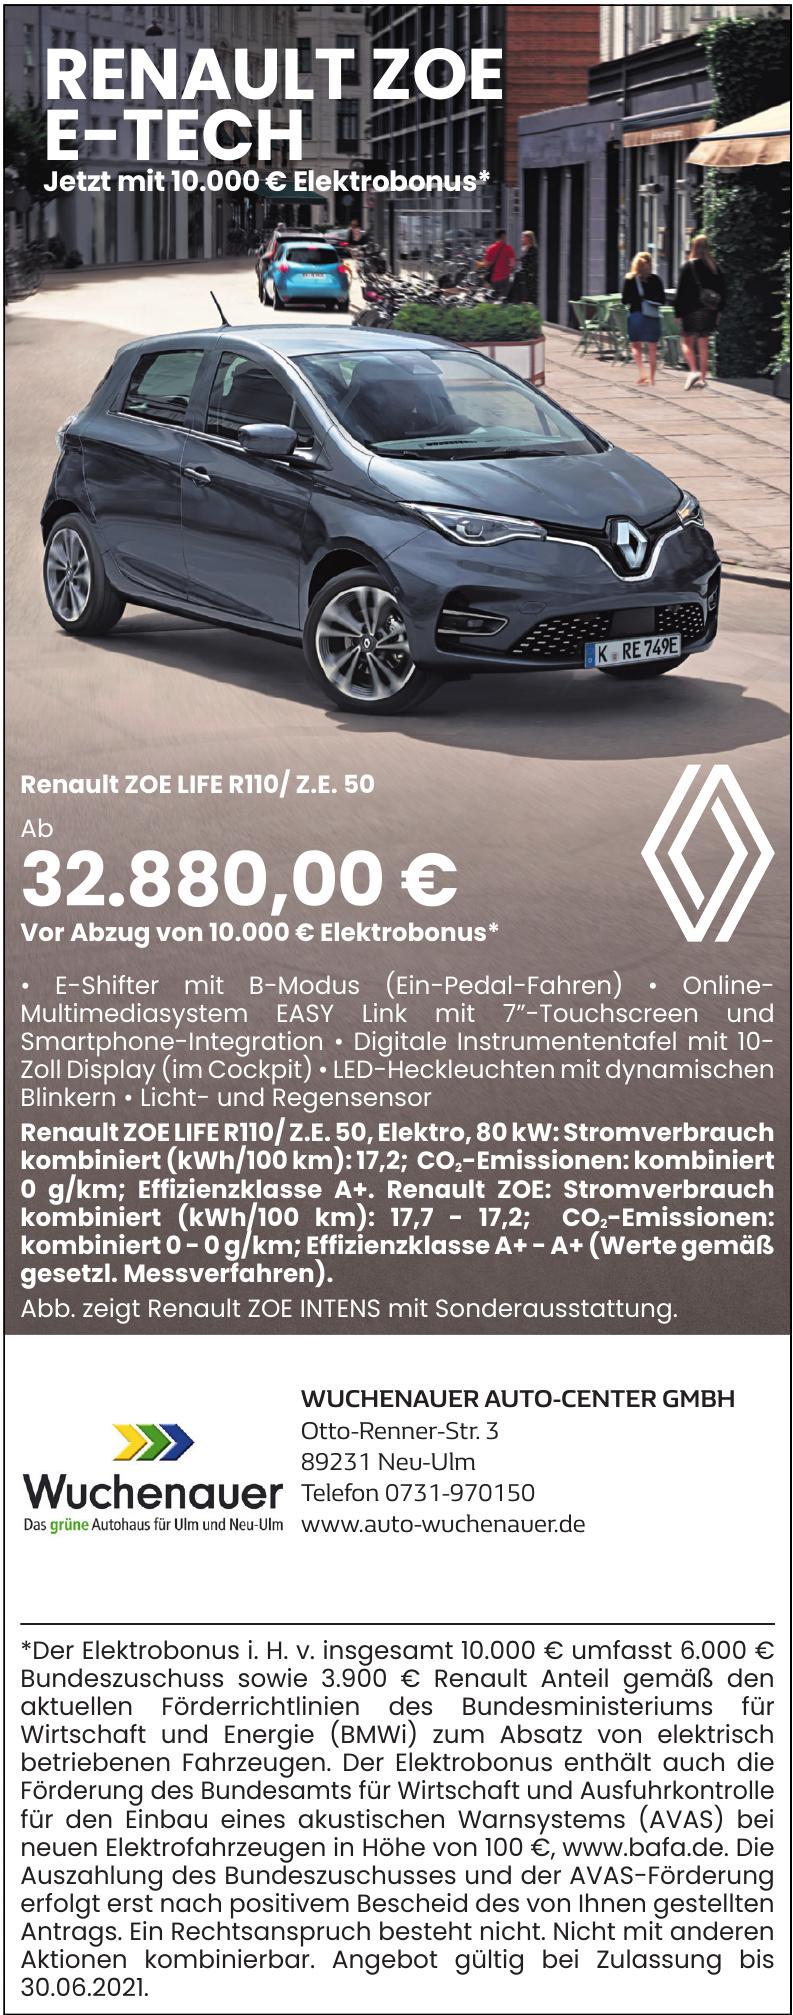 Wuchenauer Auto-Center GmbH